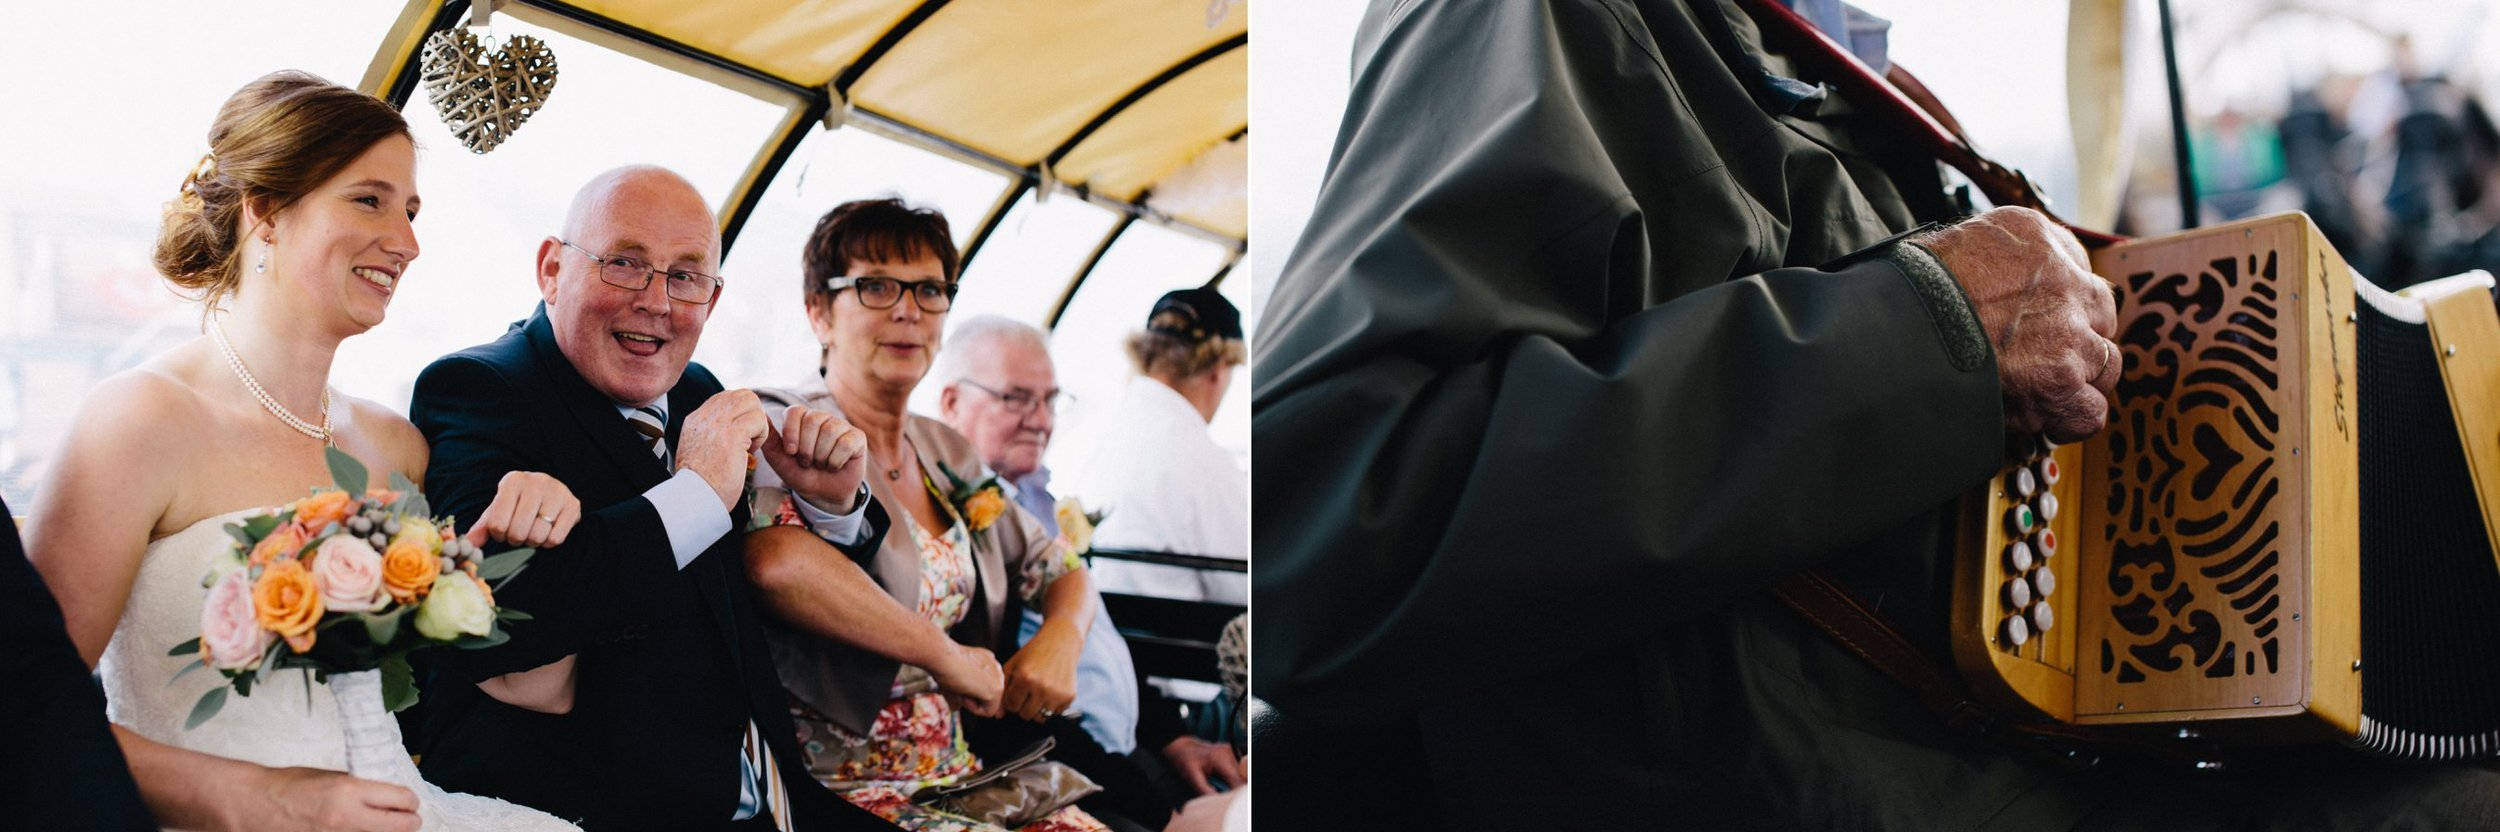 Bruidsfotografie-Terschelling-Michiel-Janette_0178.jpg